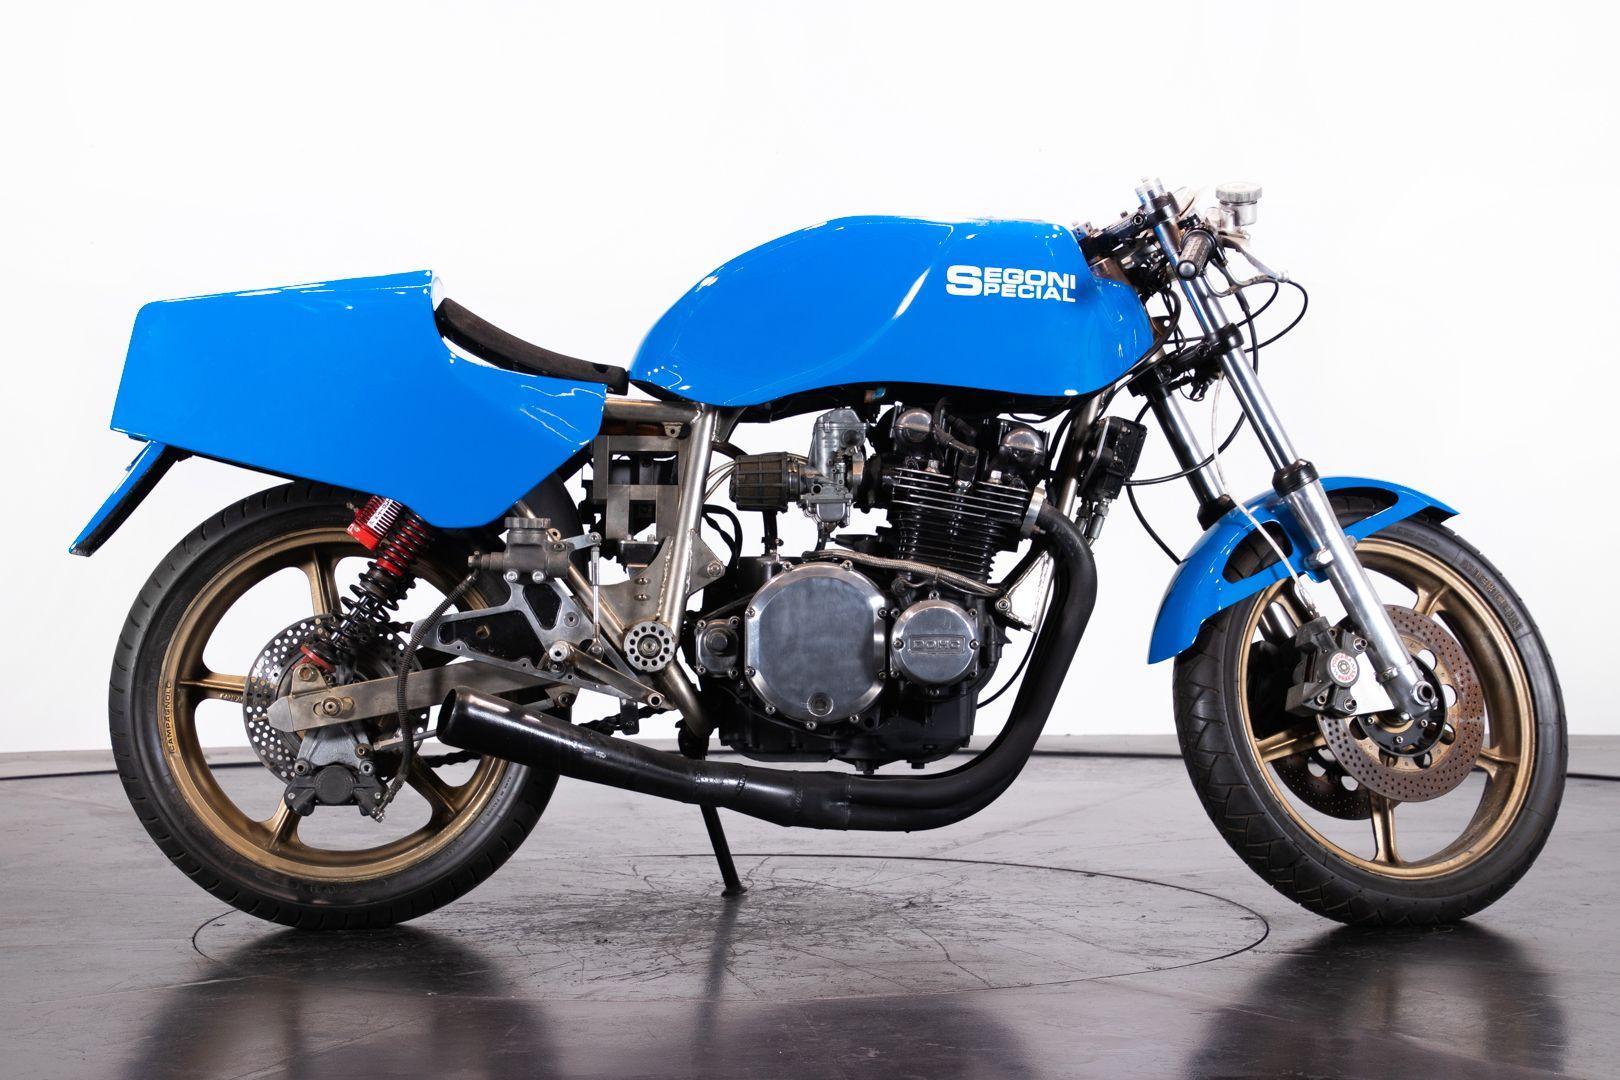 1980 Kawasaki Segoni 900 Testa Nera 74914